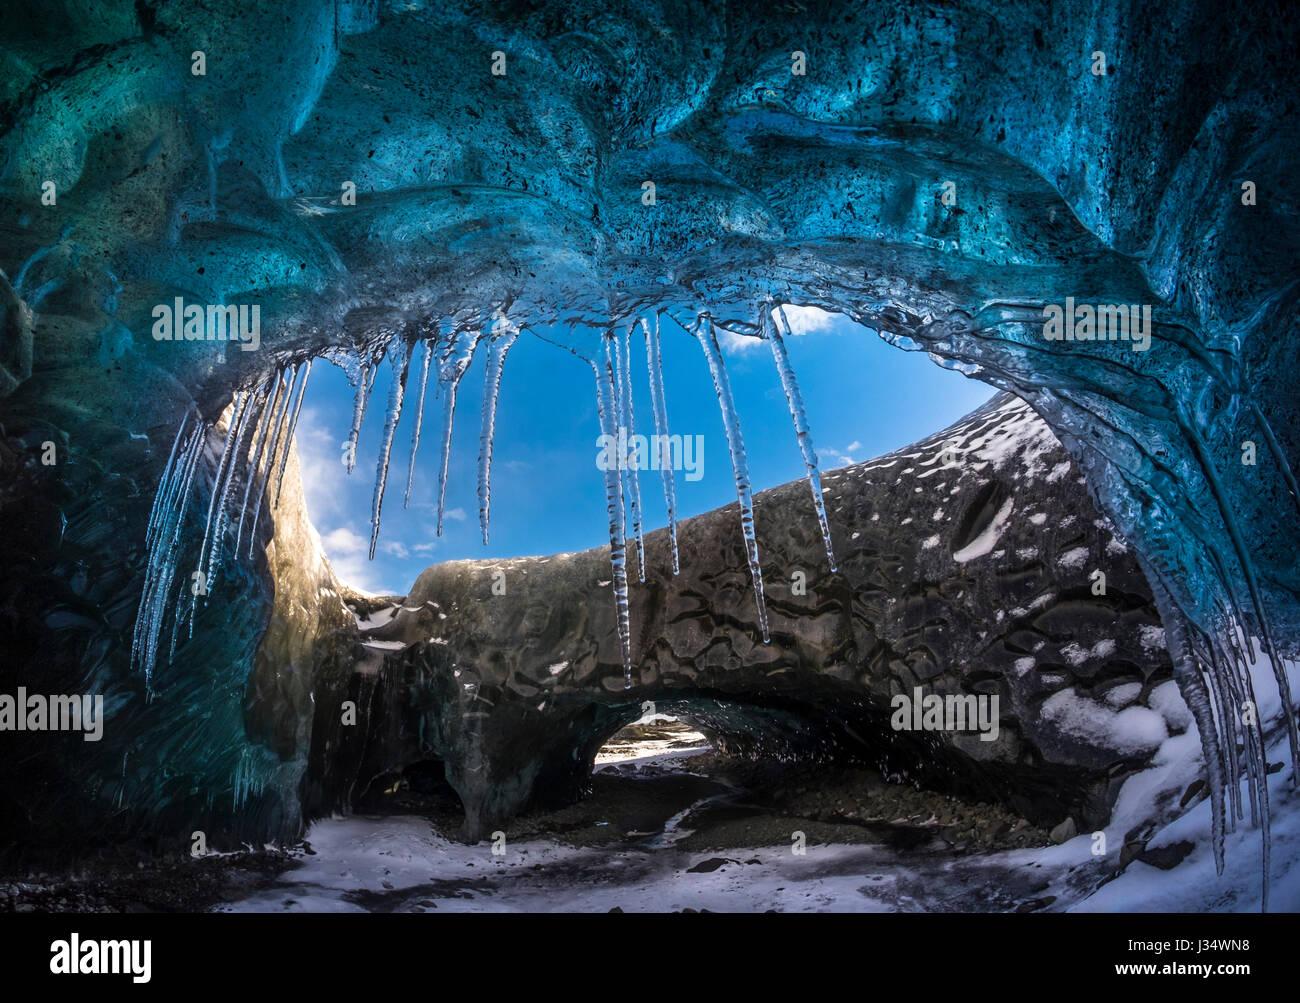 JOKULSARLON, ICELAND - CIRCA MARCH 2015: Ice cave near the Glacial Lagoon in the  Vatnajökull National Park - Stock Image